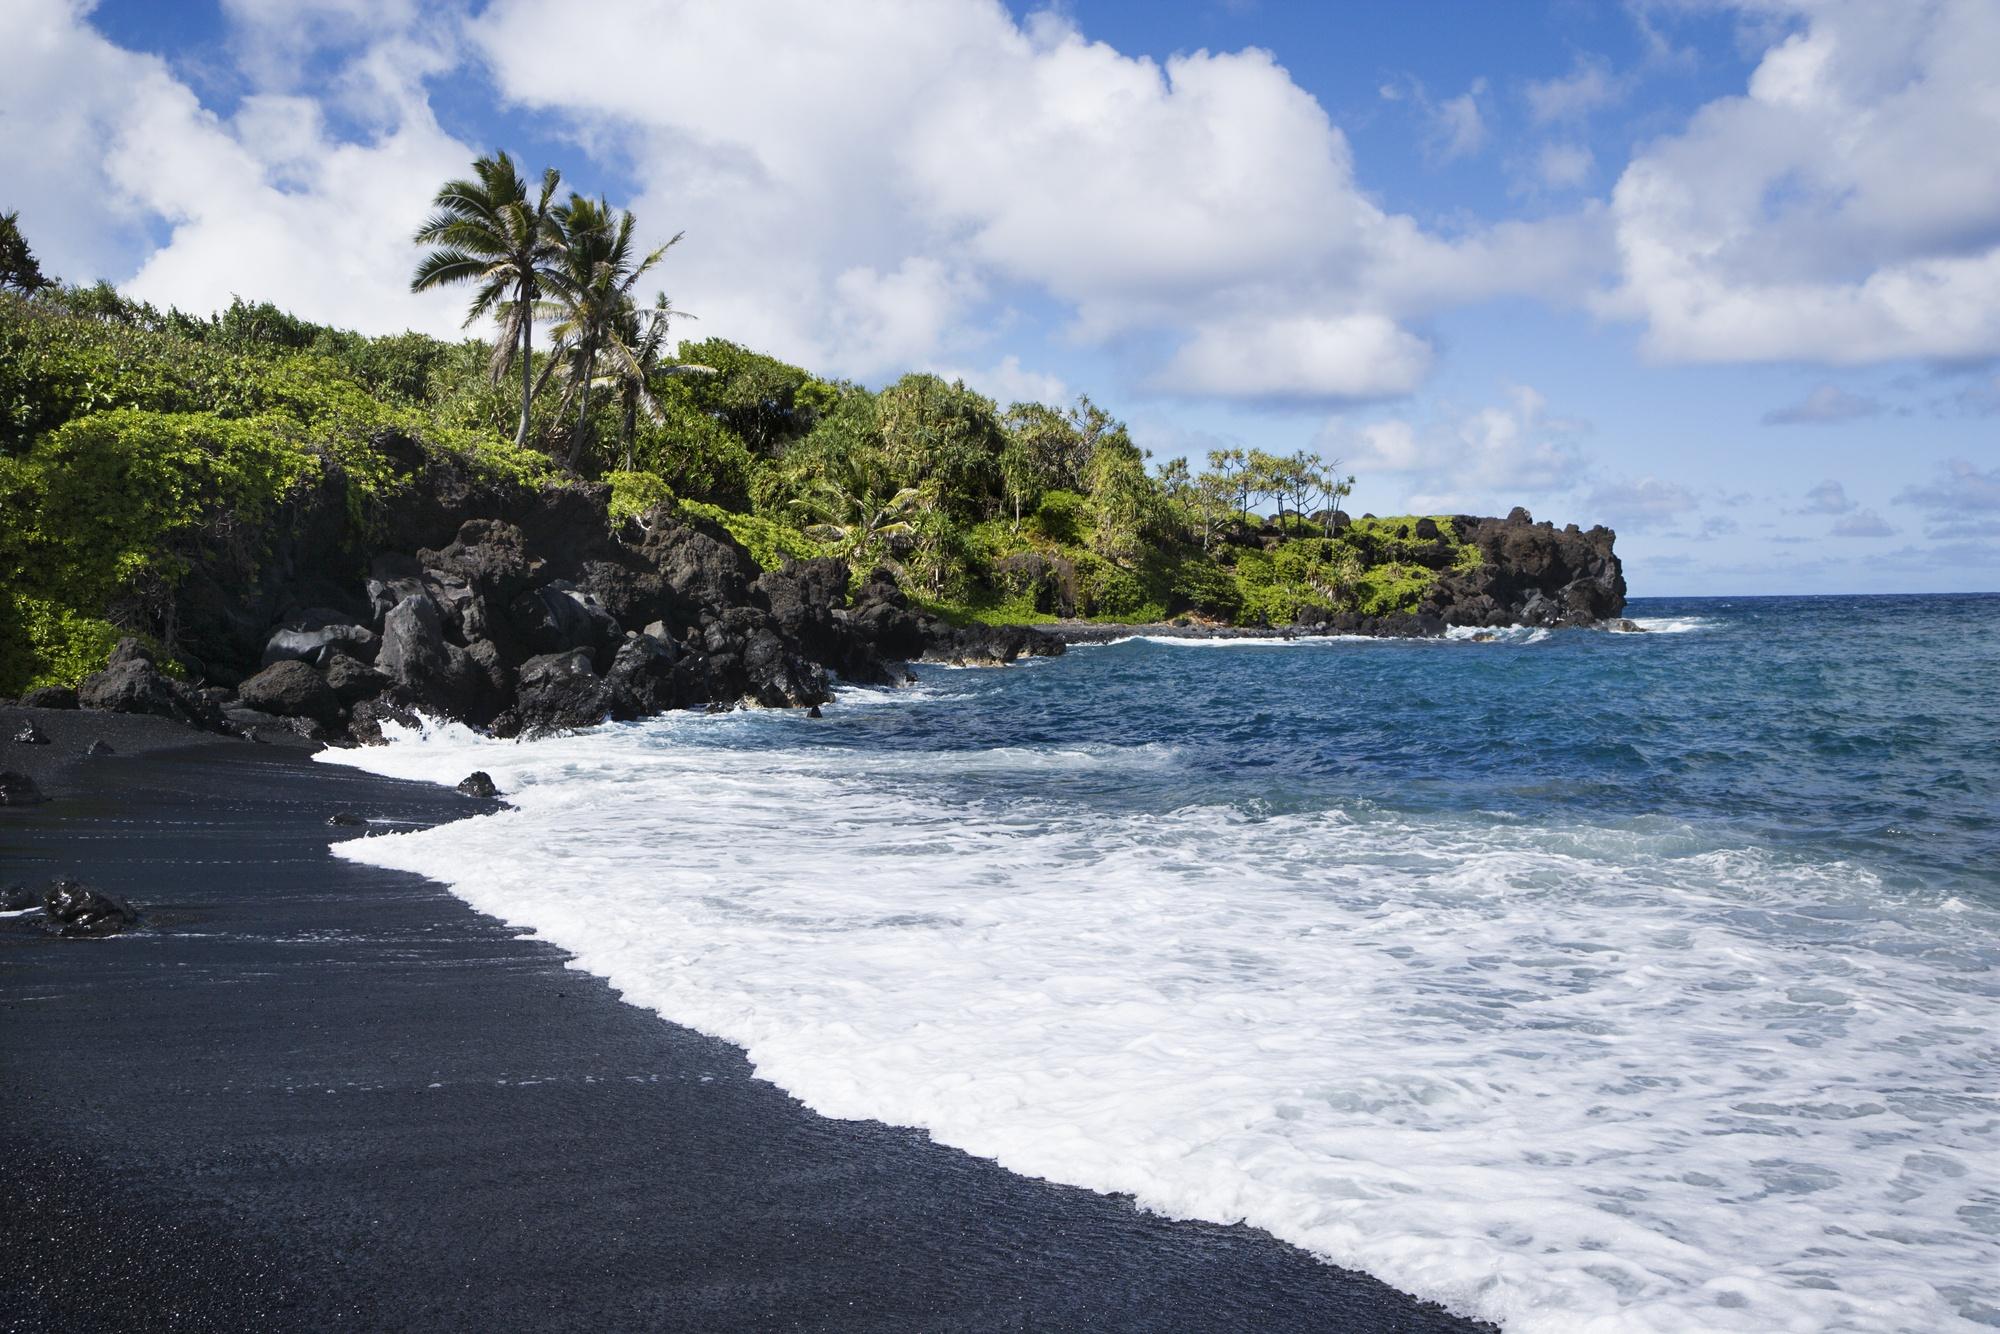 Black sand beach in Western state Maui, Hawaii